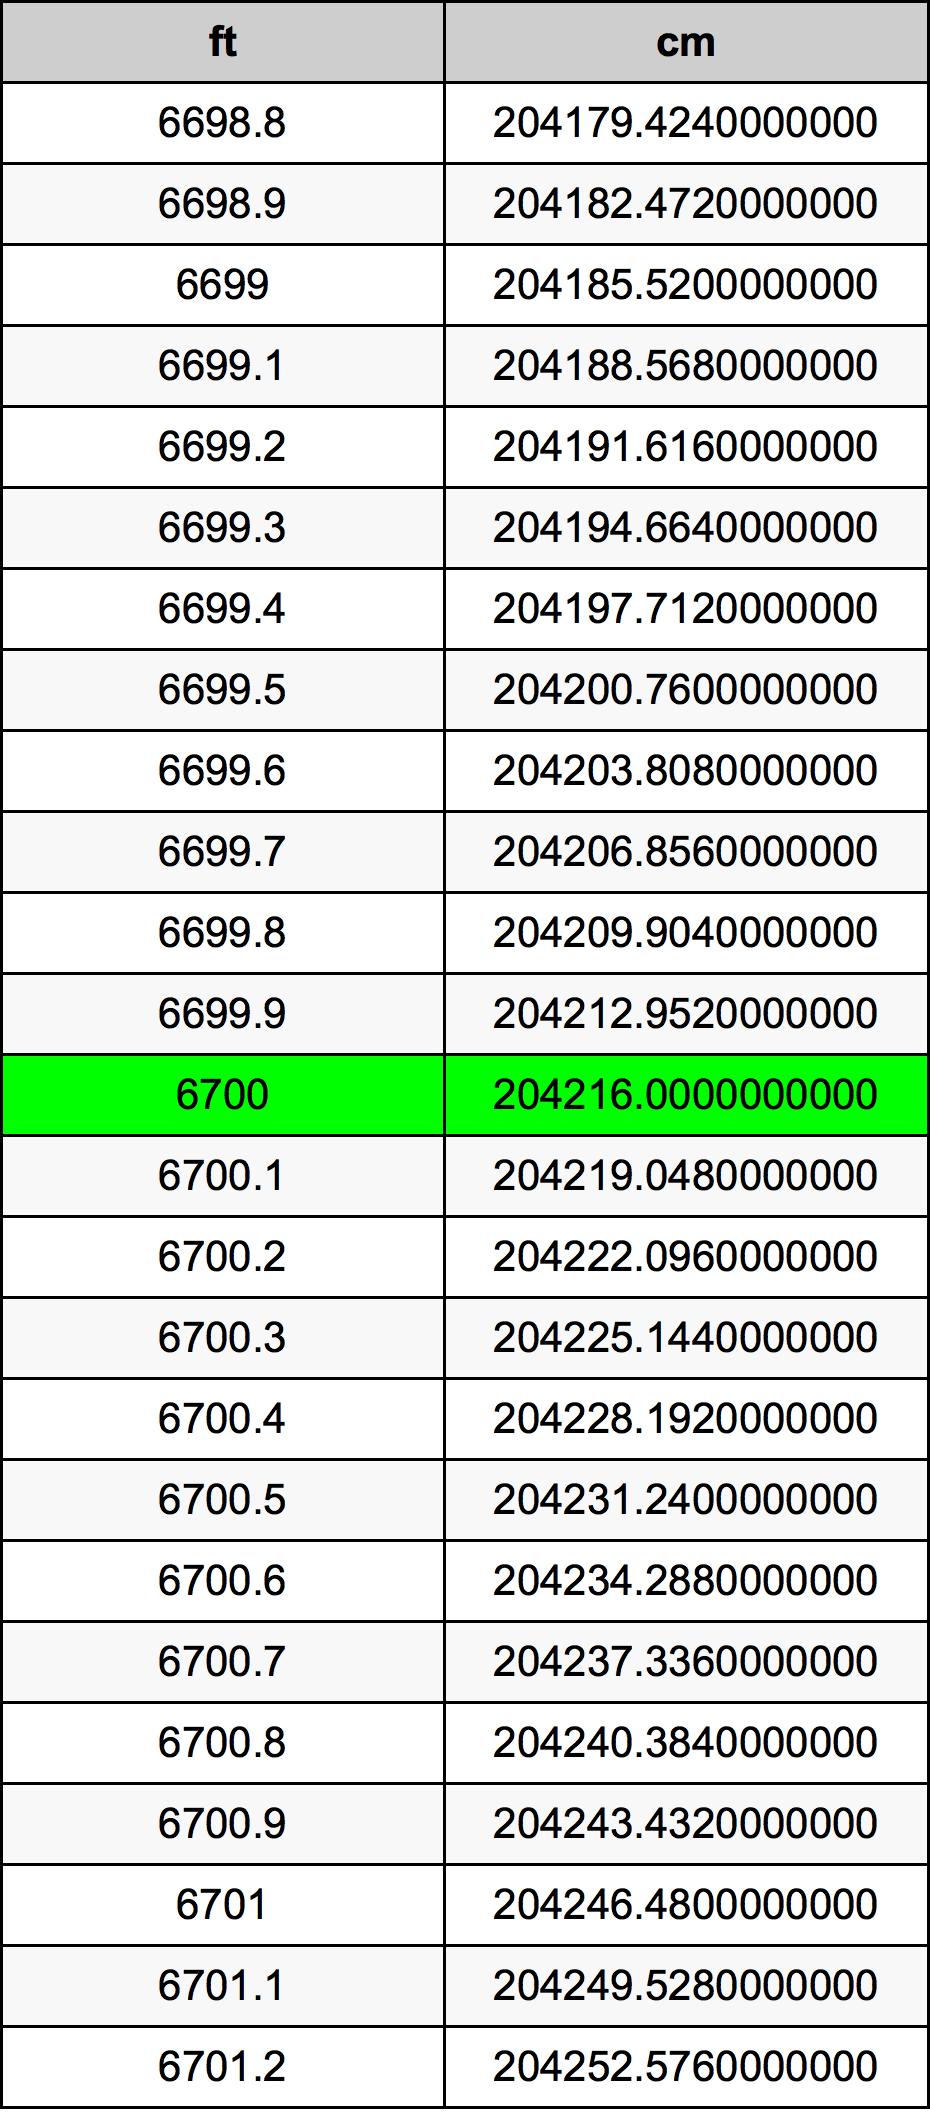 6700 Piedi konverżjoni tabella